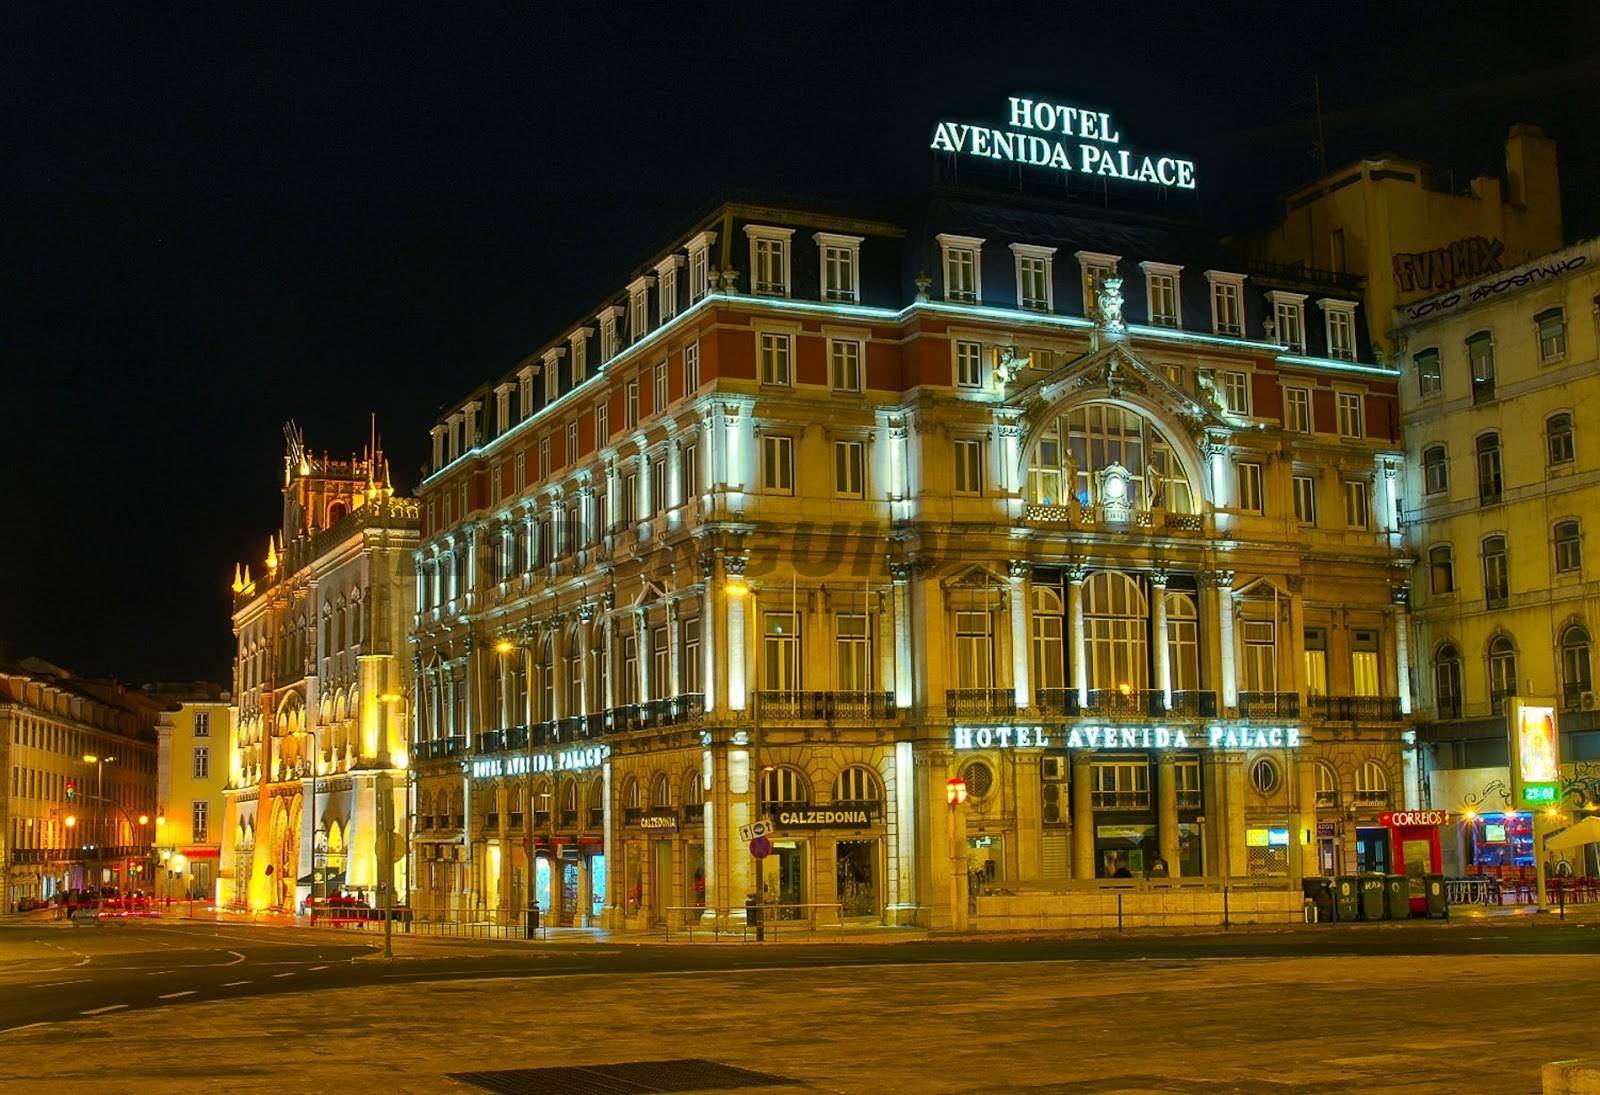 Avenida Palace Hotel on Neoclassical Engineering